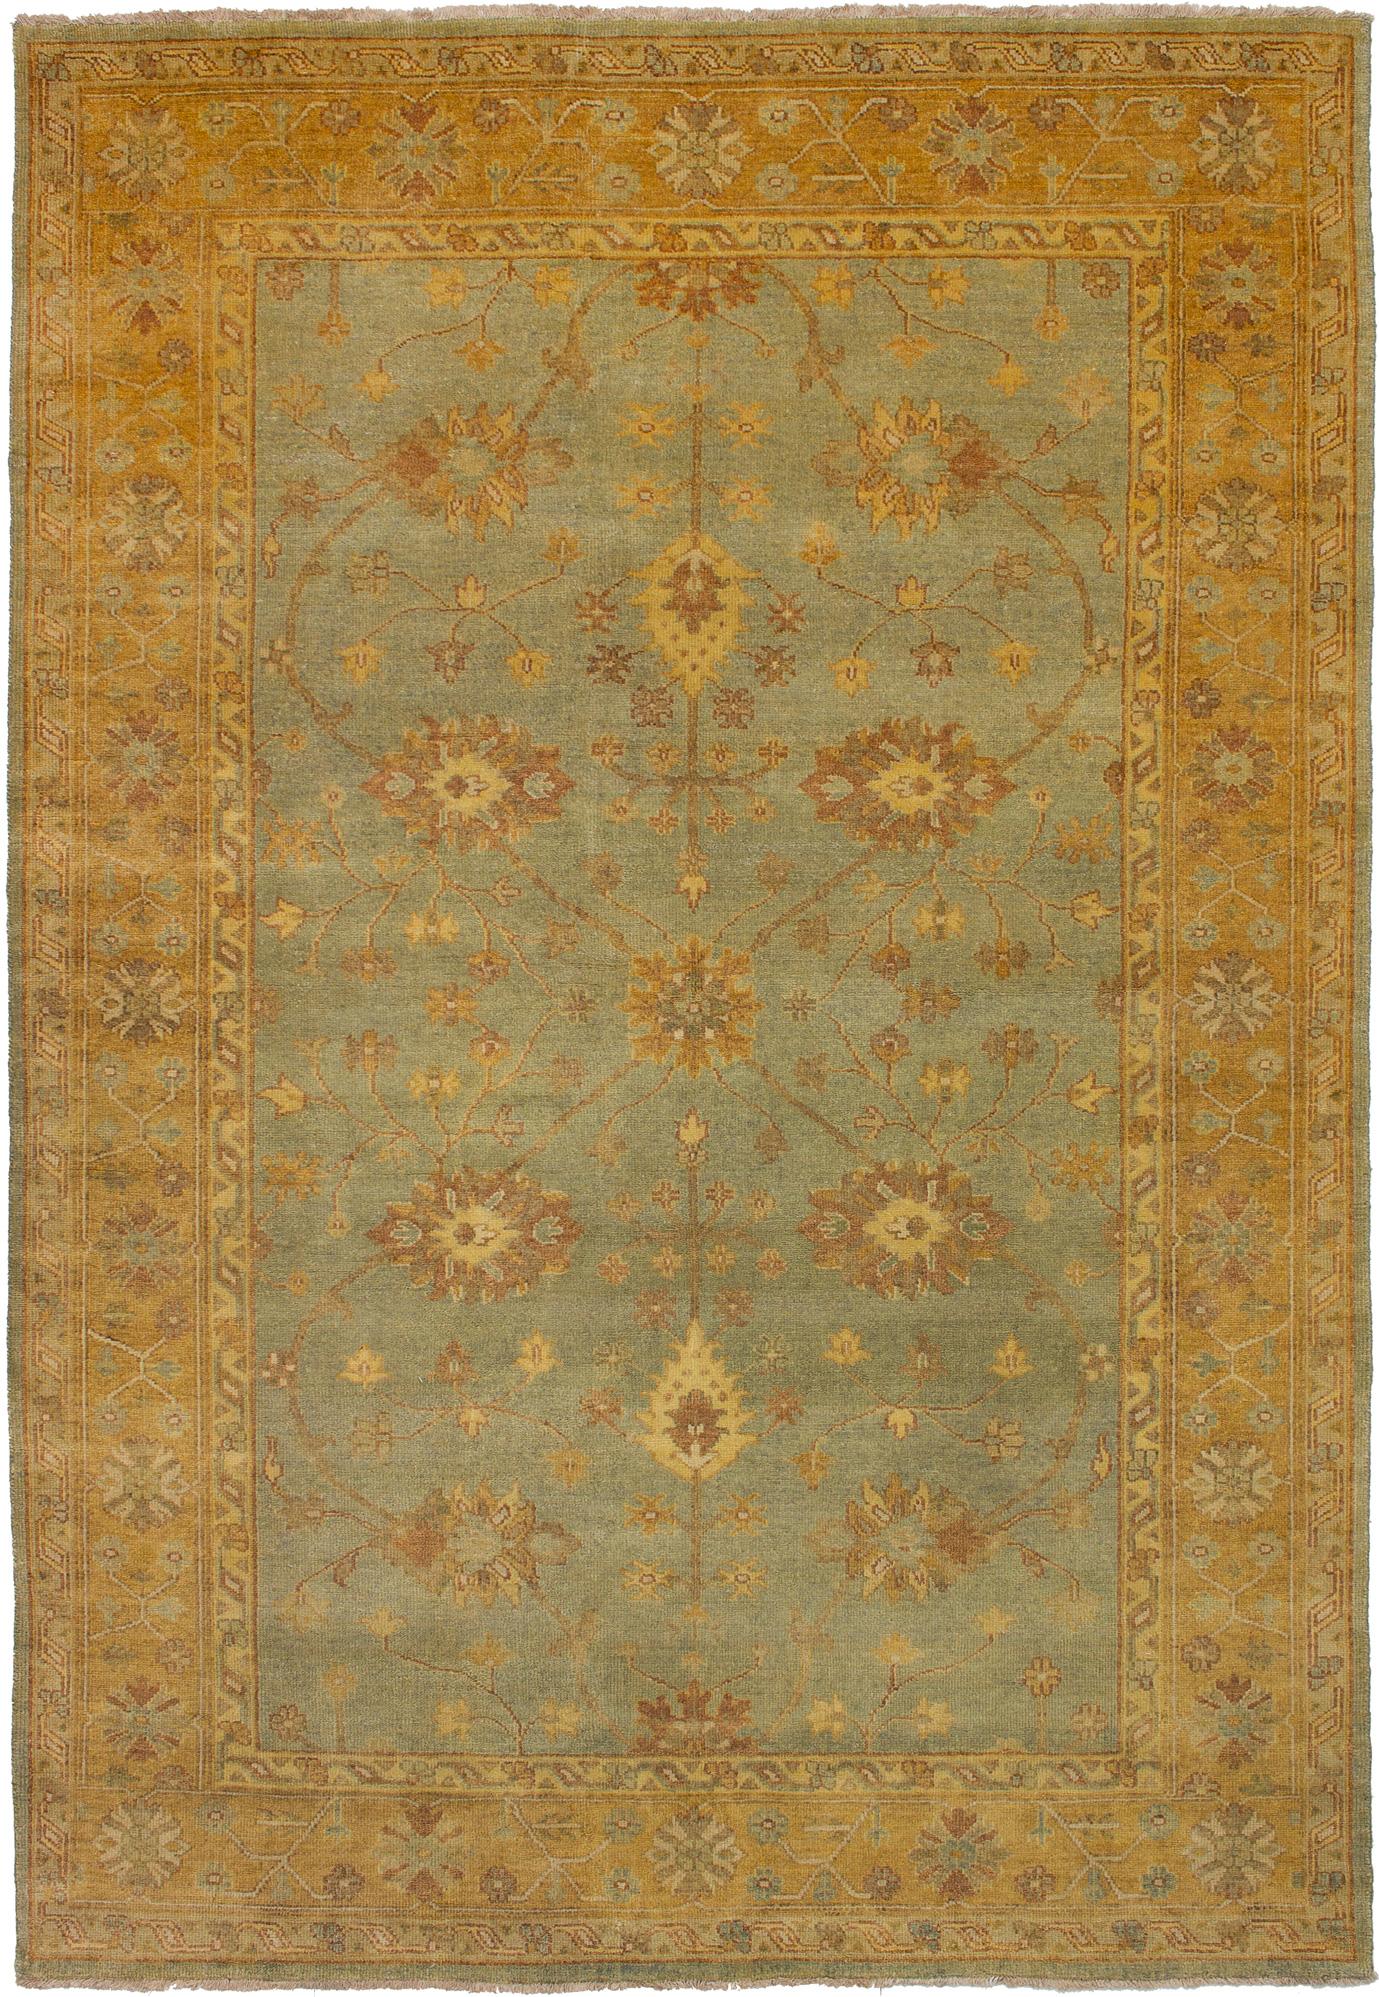 "Hand-knotted Royal Ushak Light Blue  Wool Rug 6'1"" x 8'10"" Size: 6'1"" x 8'10"""